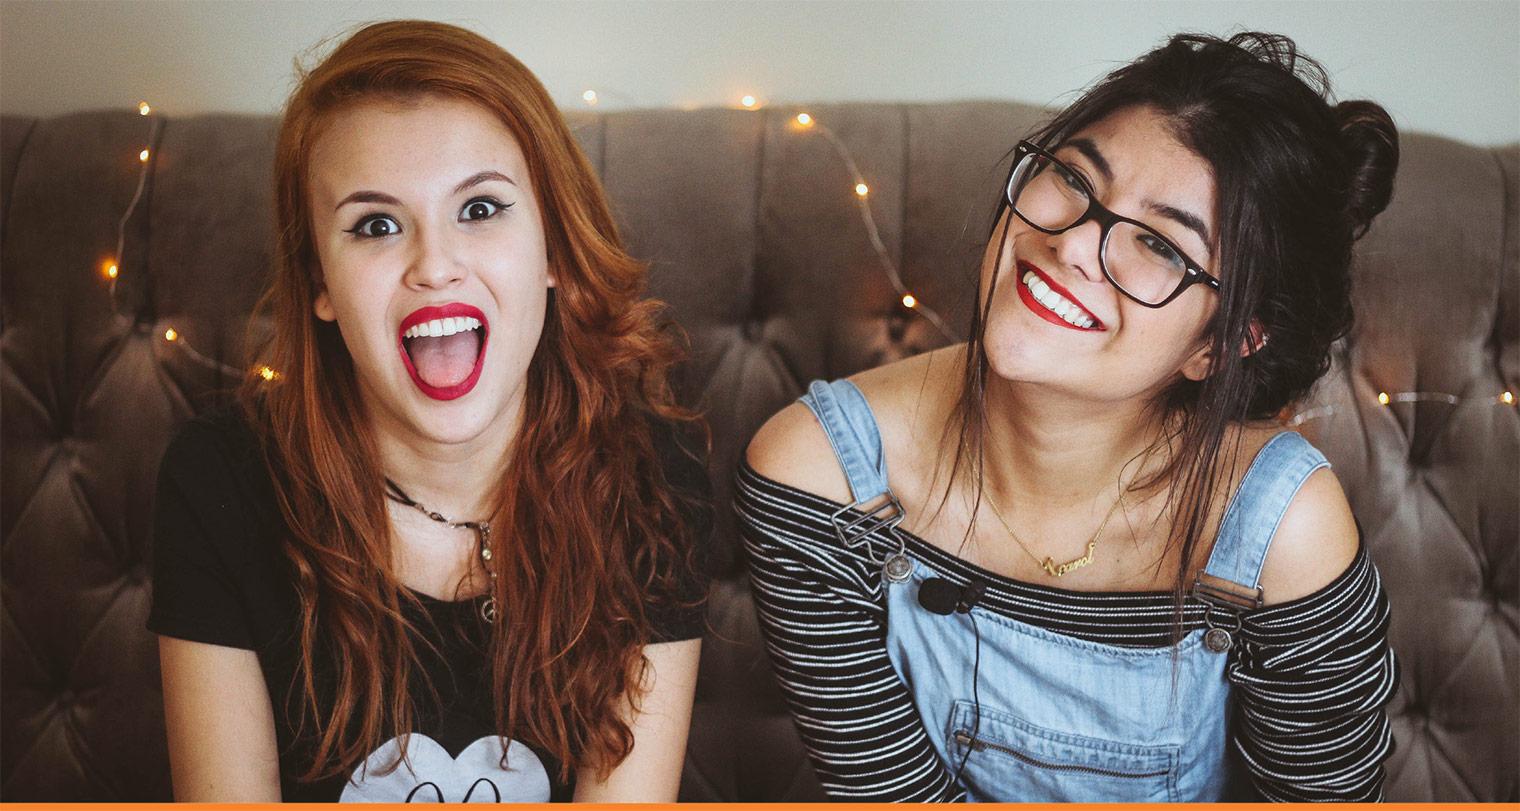 2 student girls